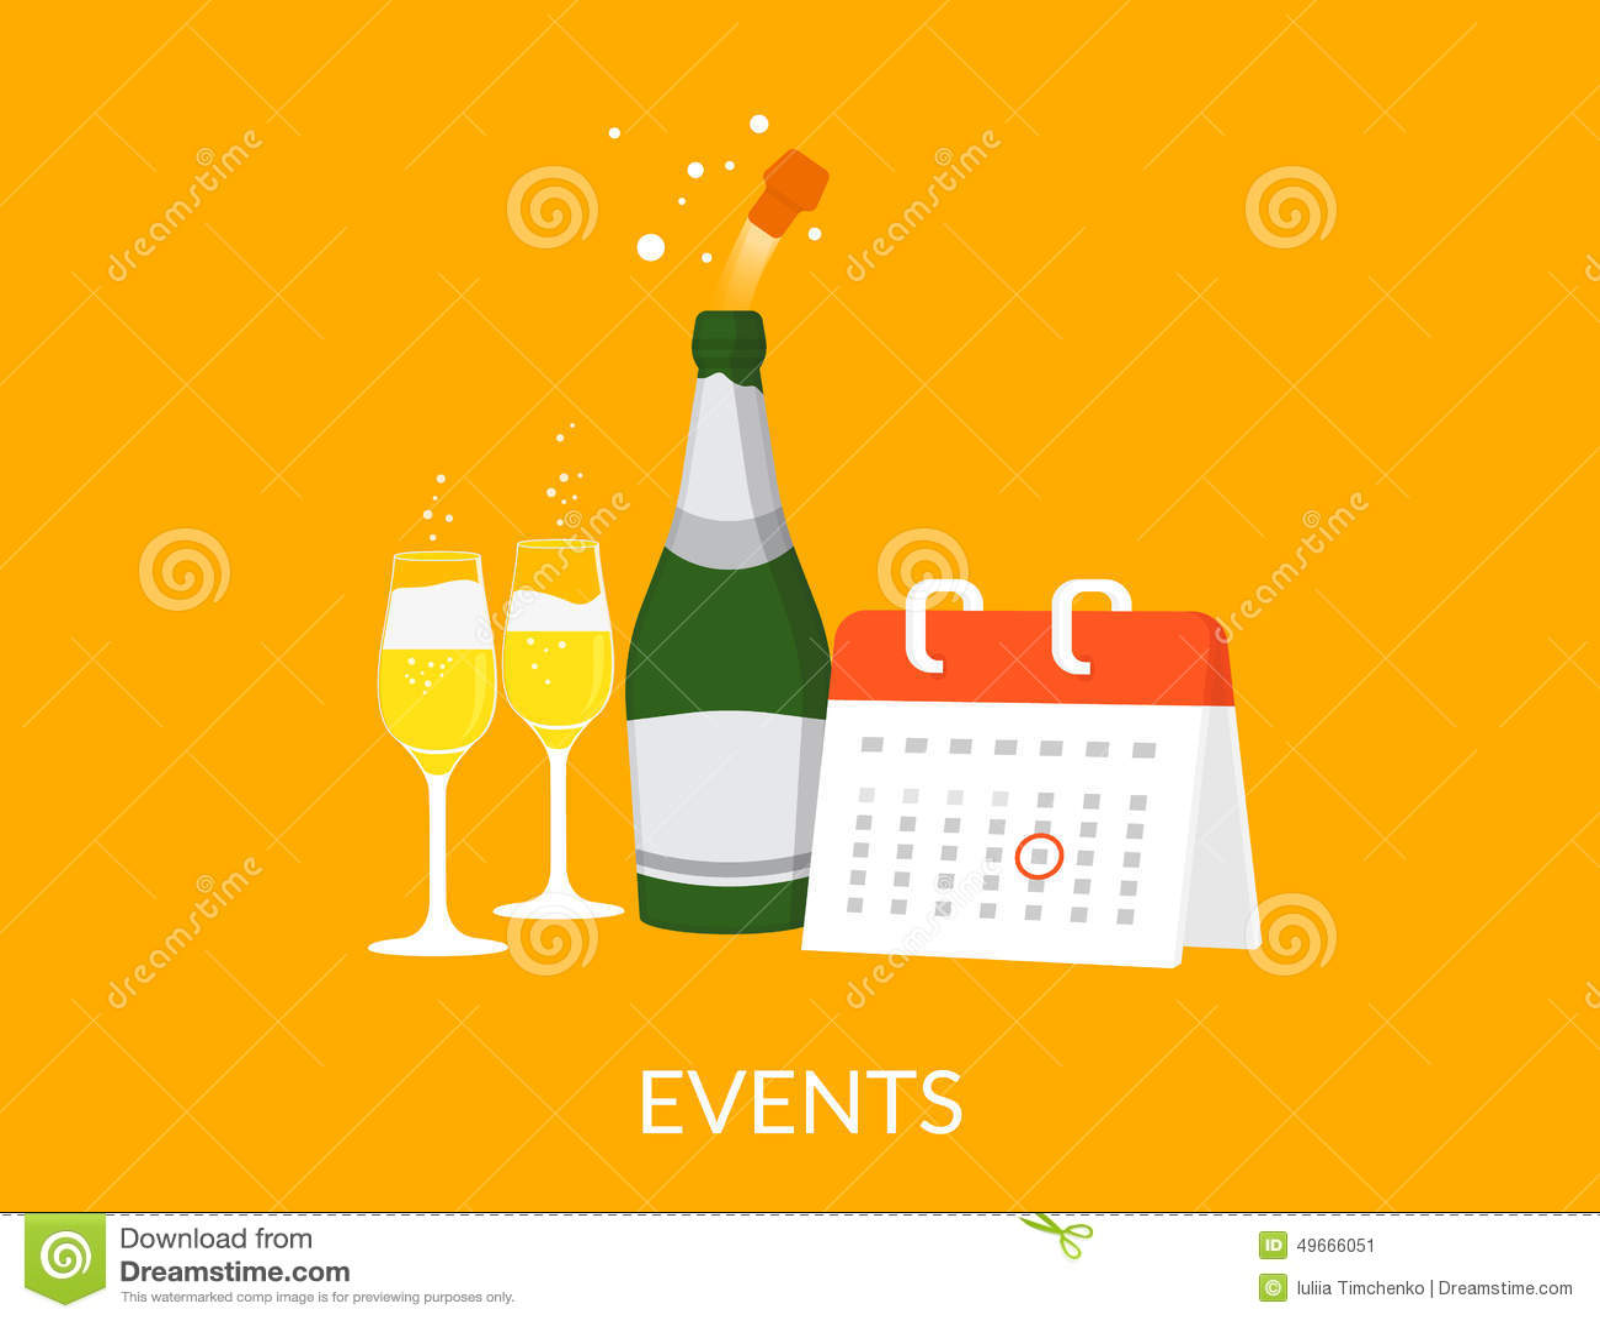 Event Calendar Illustration : Events illustration stock vector image